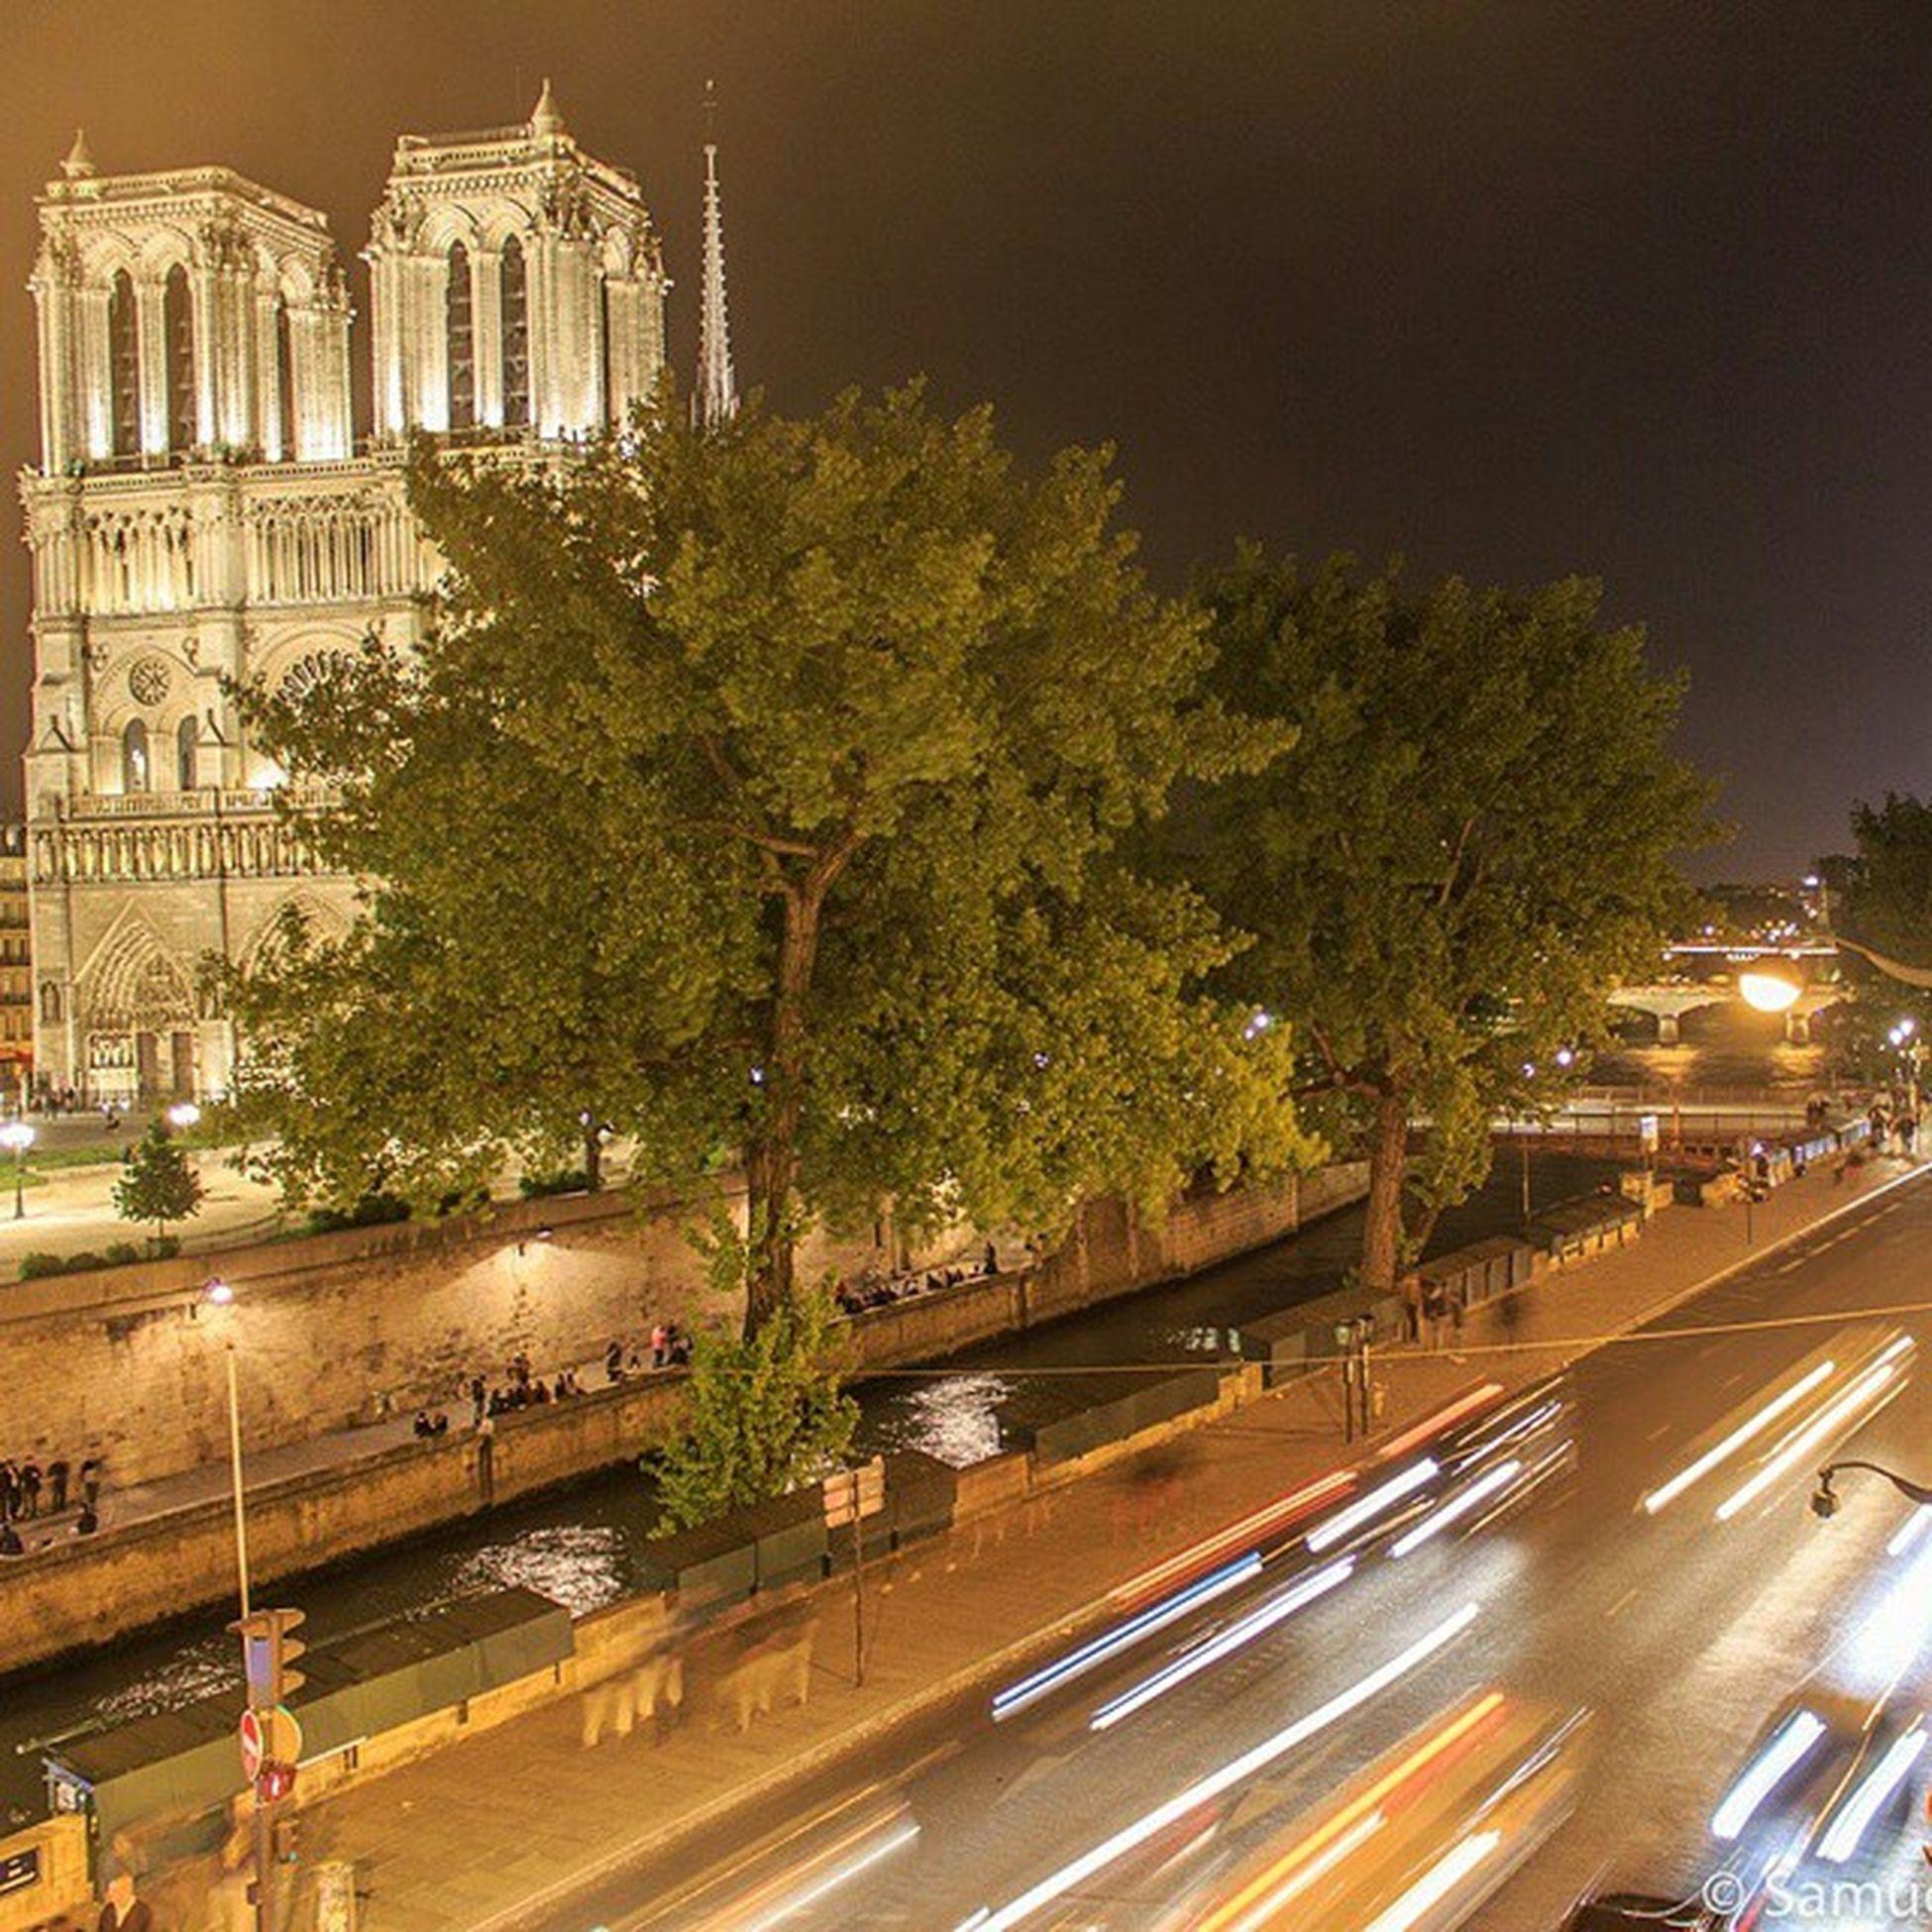 Parisholiday Paris France Notredame night wonderful_places